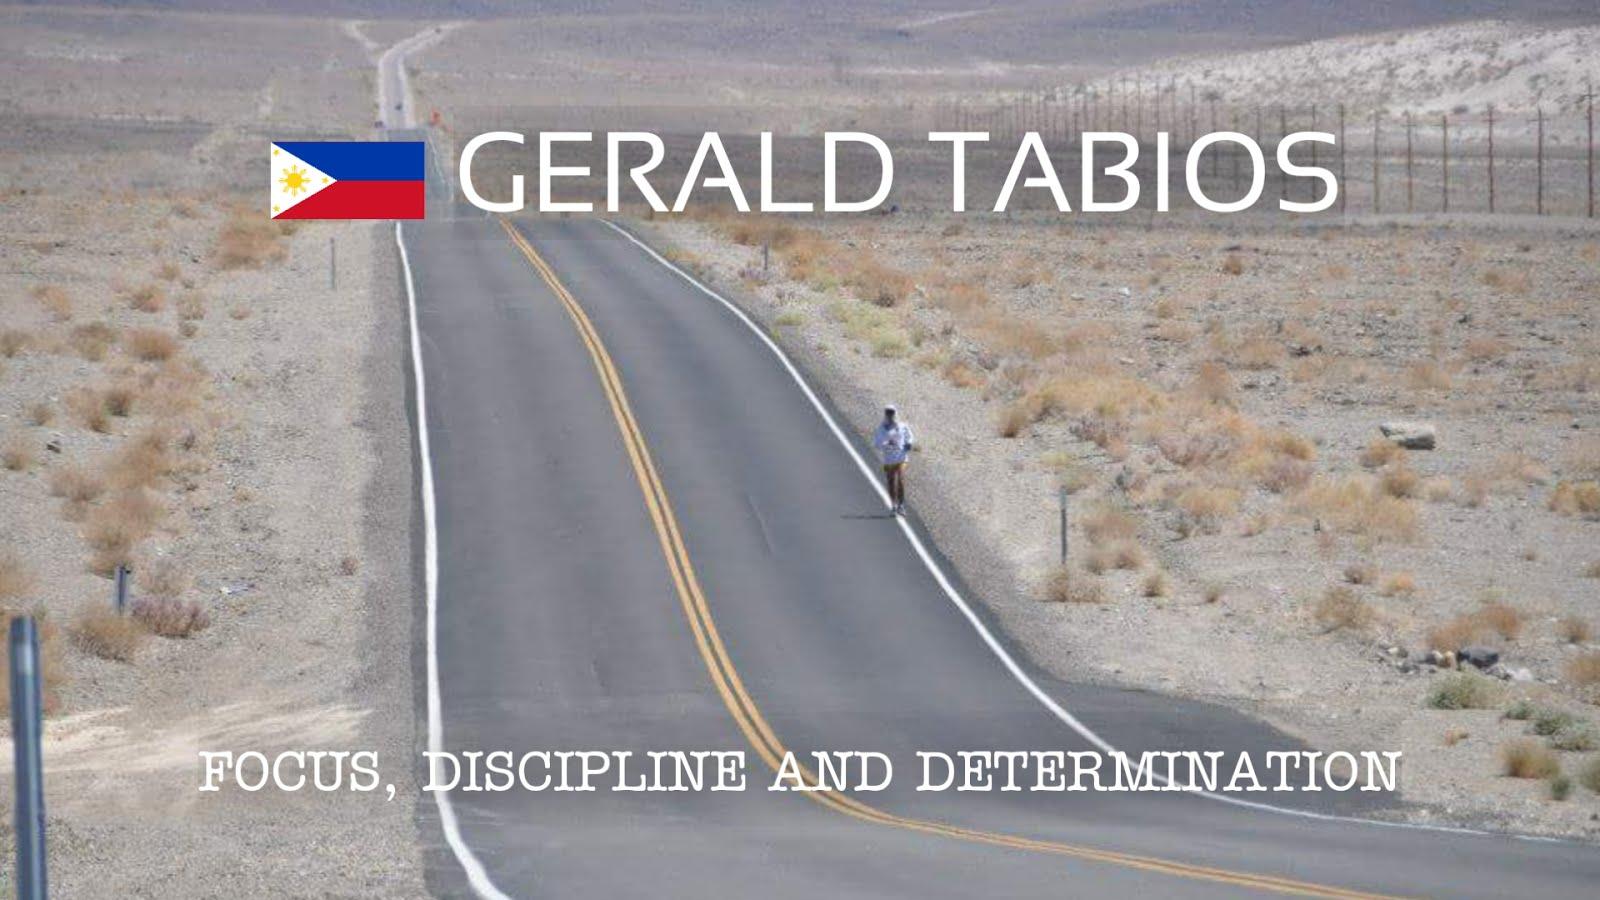 GERALD TABIOS